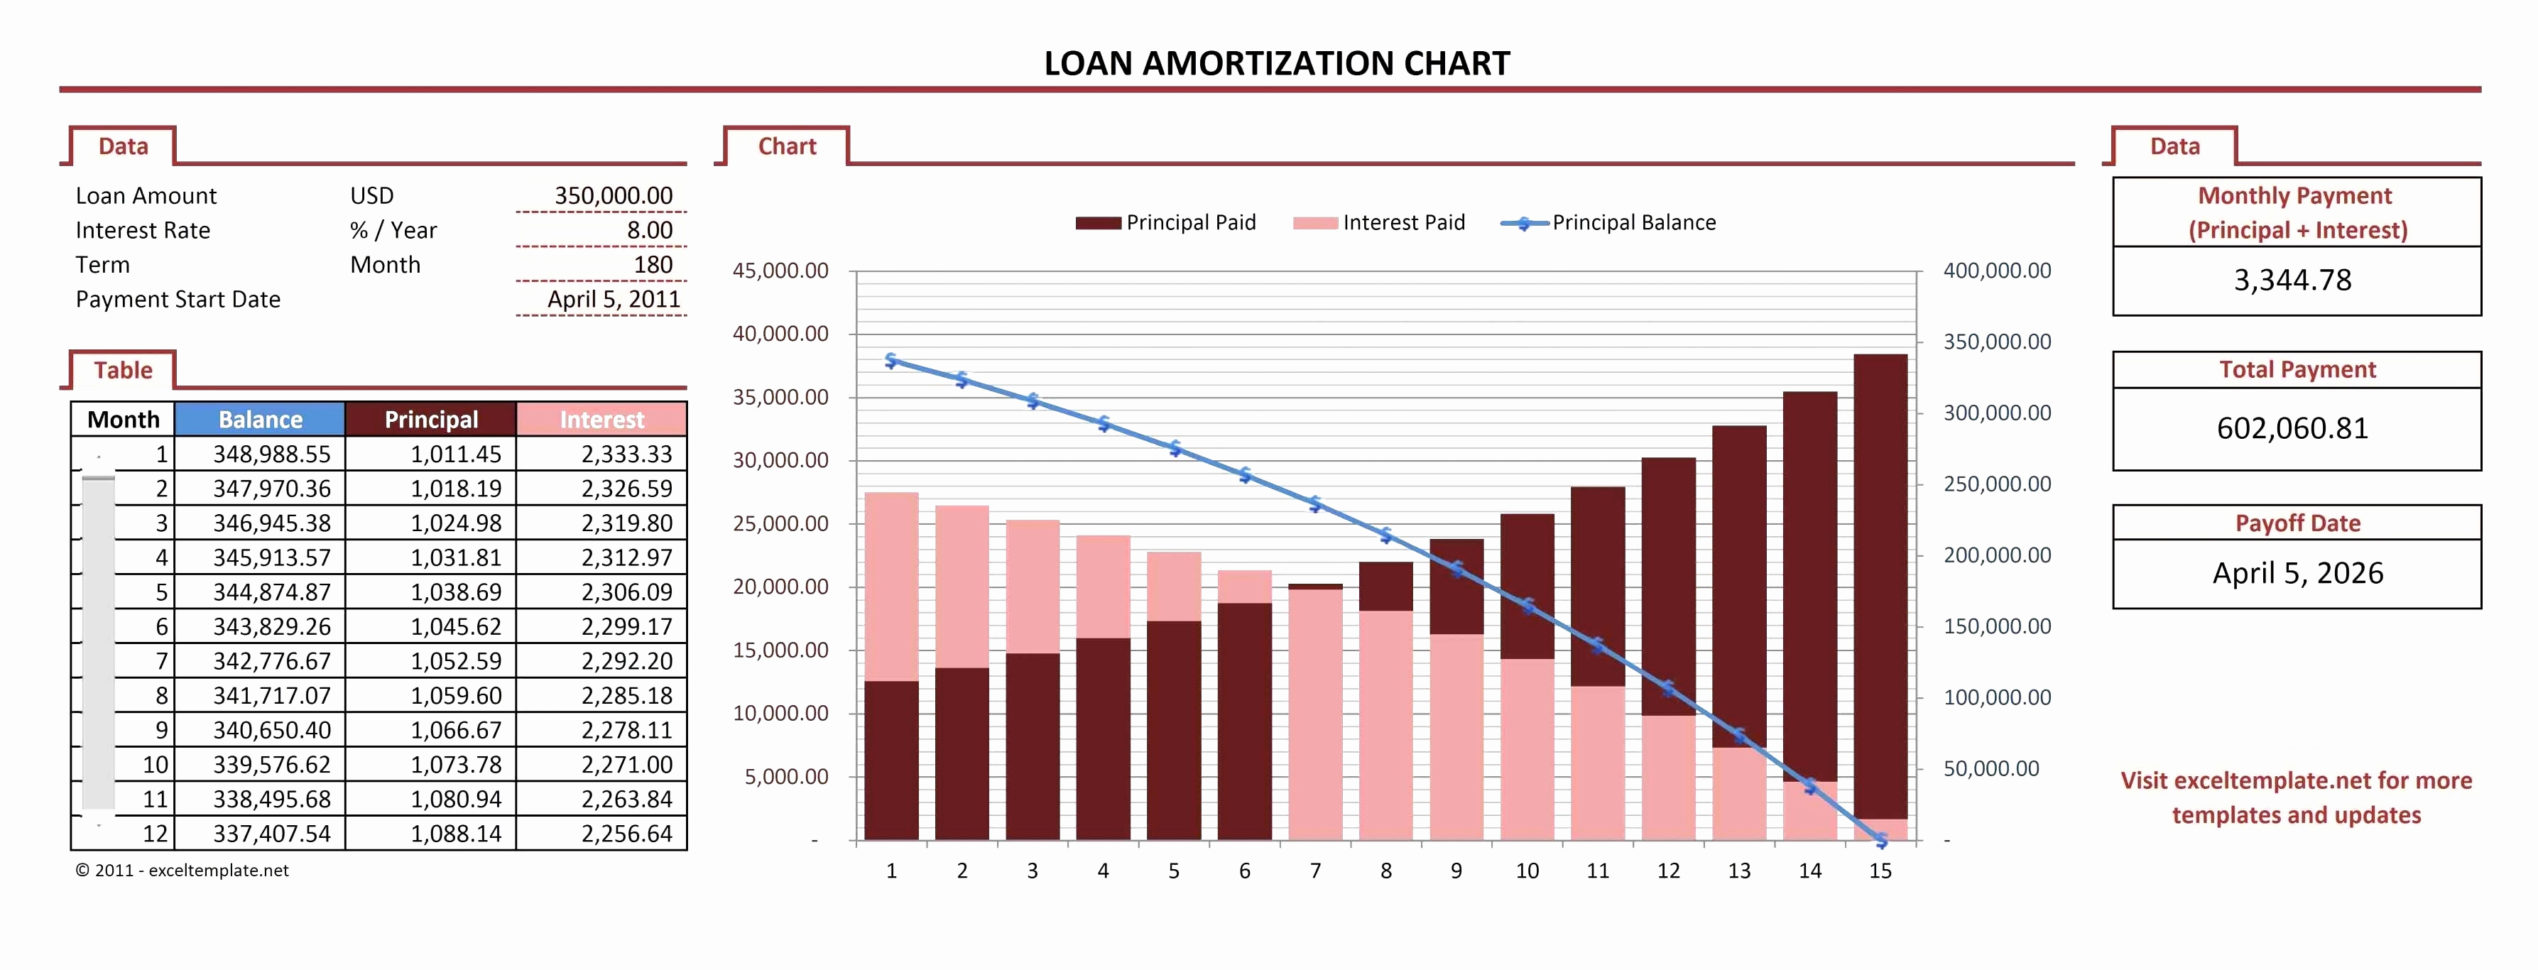 Car Loan Amortization Spreadsheet Excel Within Car Amortization Calculator Excel Luxury Schedule Auto Loan